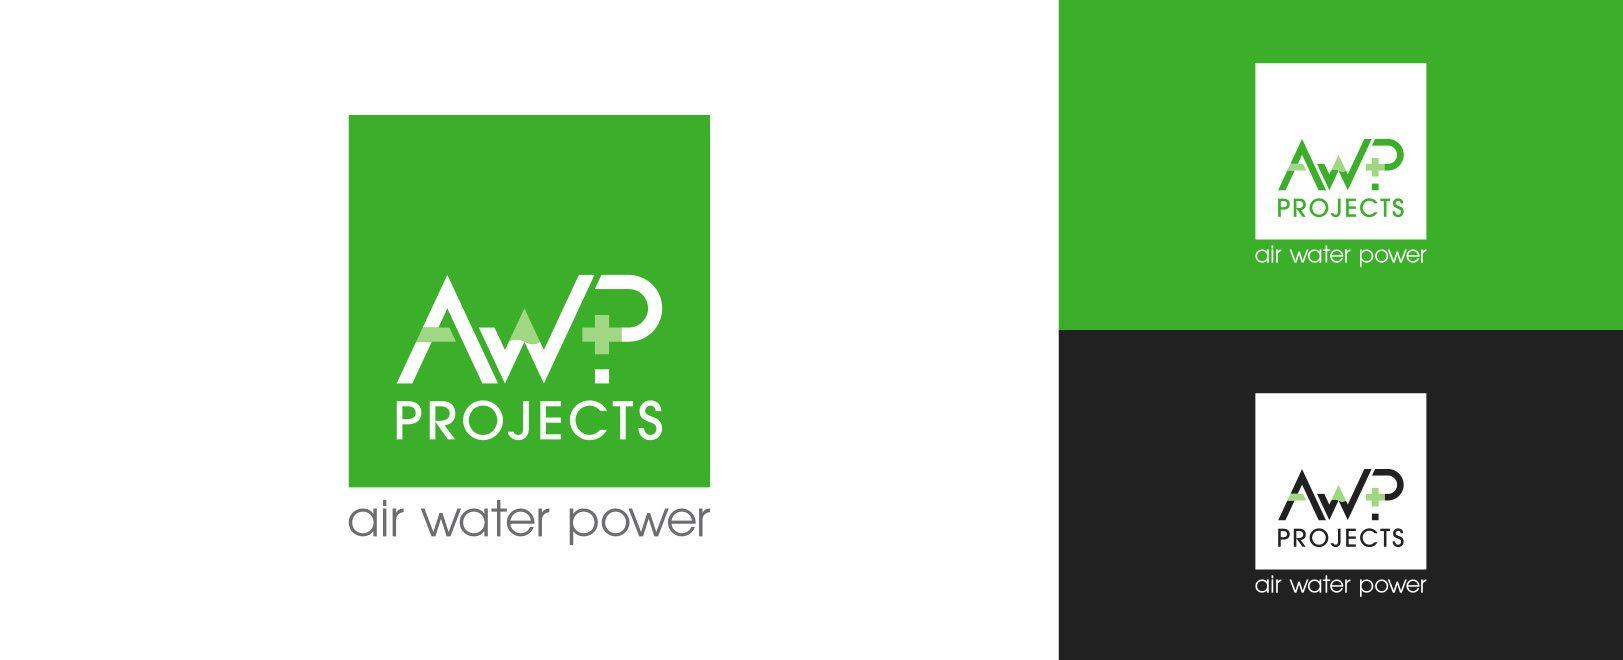 AWP - Cronulla Web Design - Branding & Logo Design